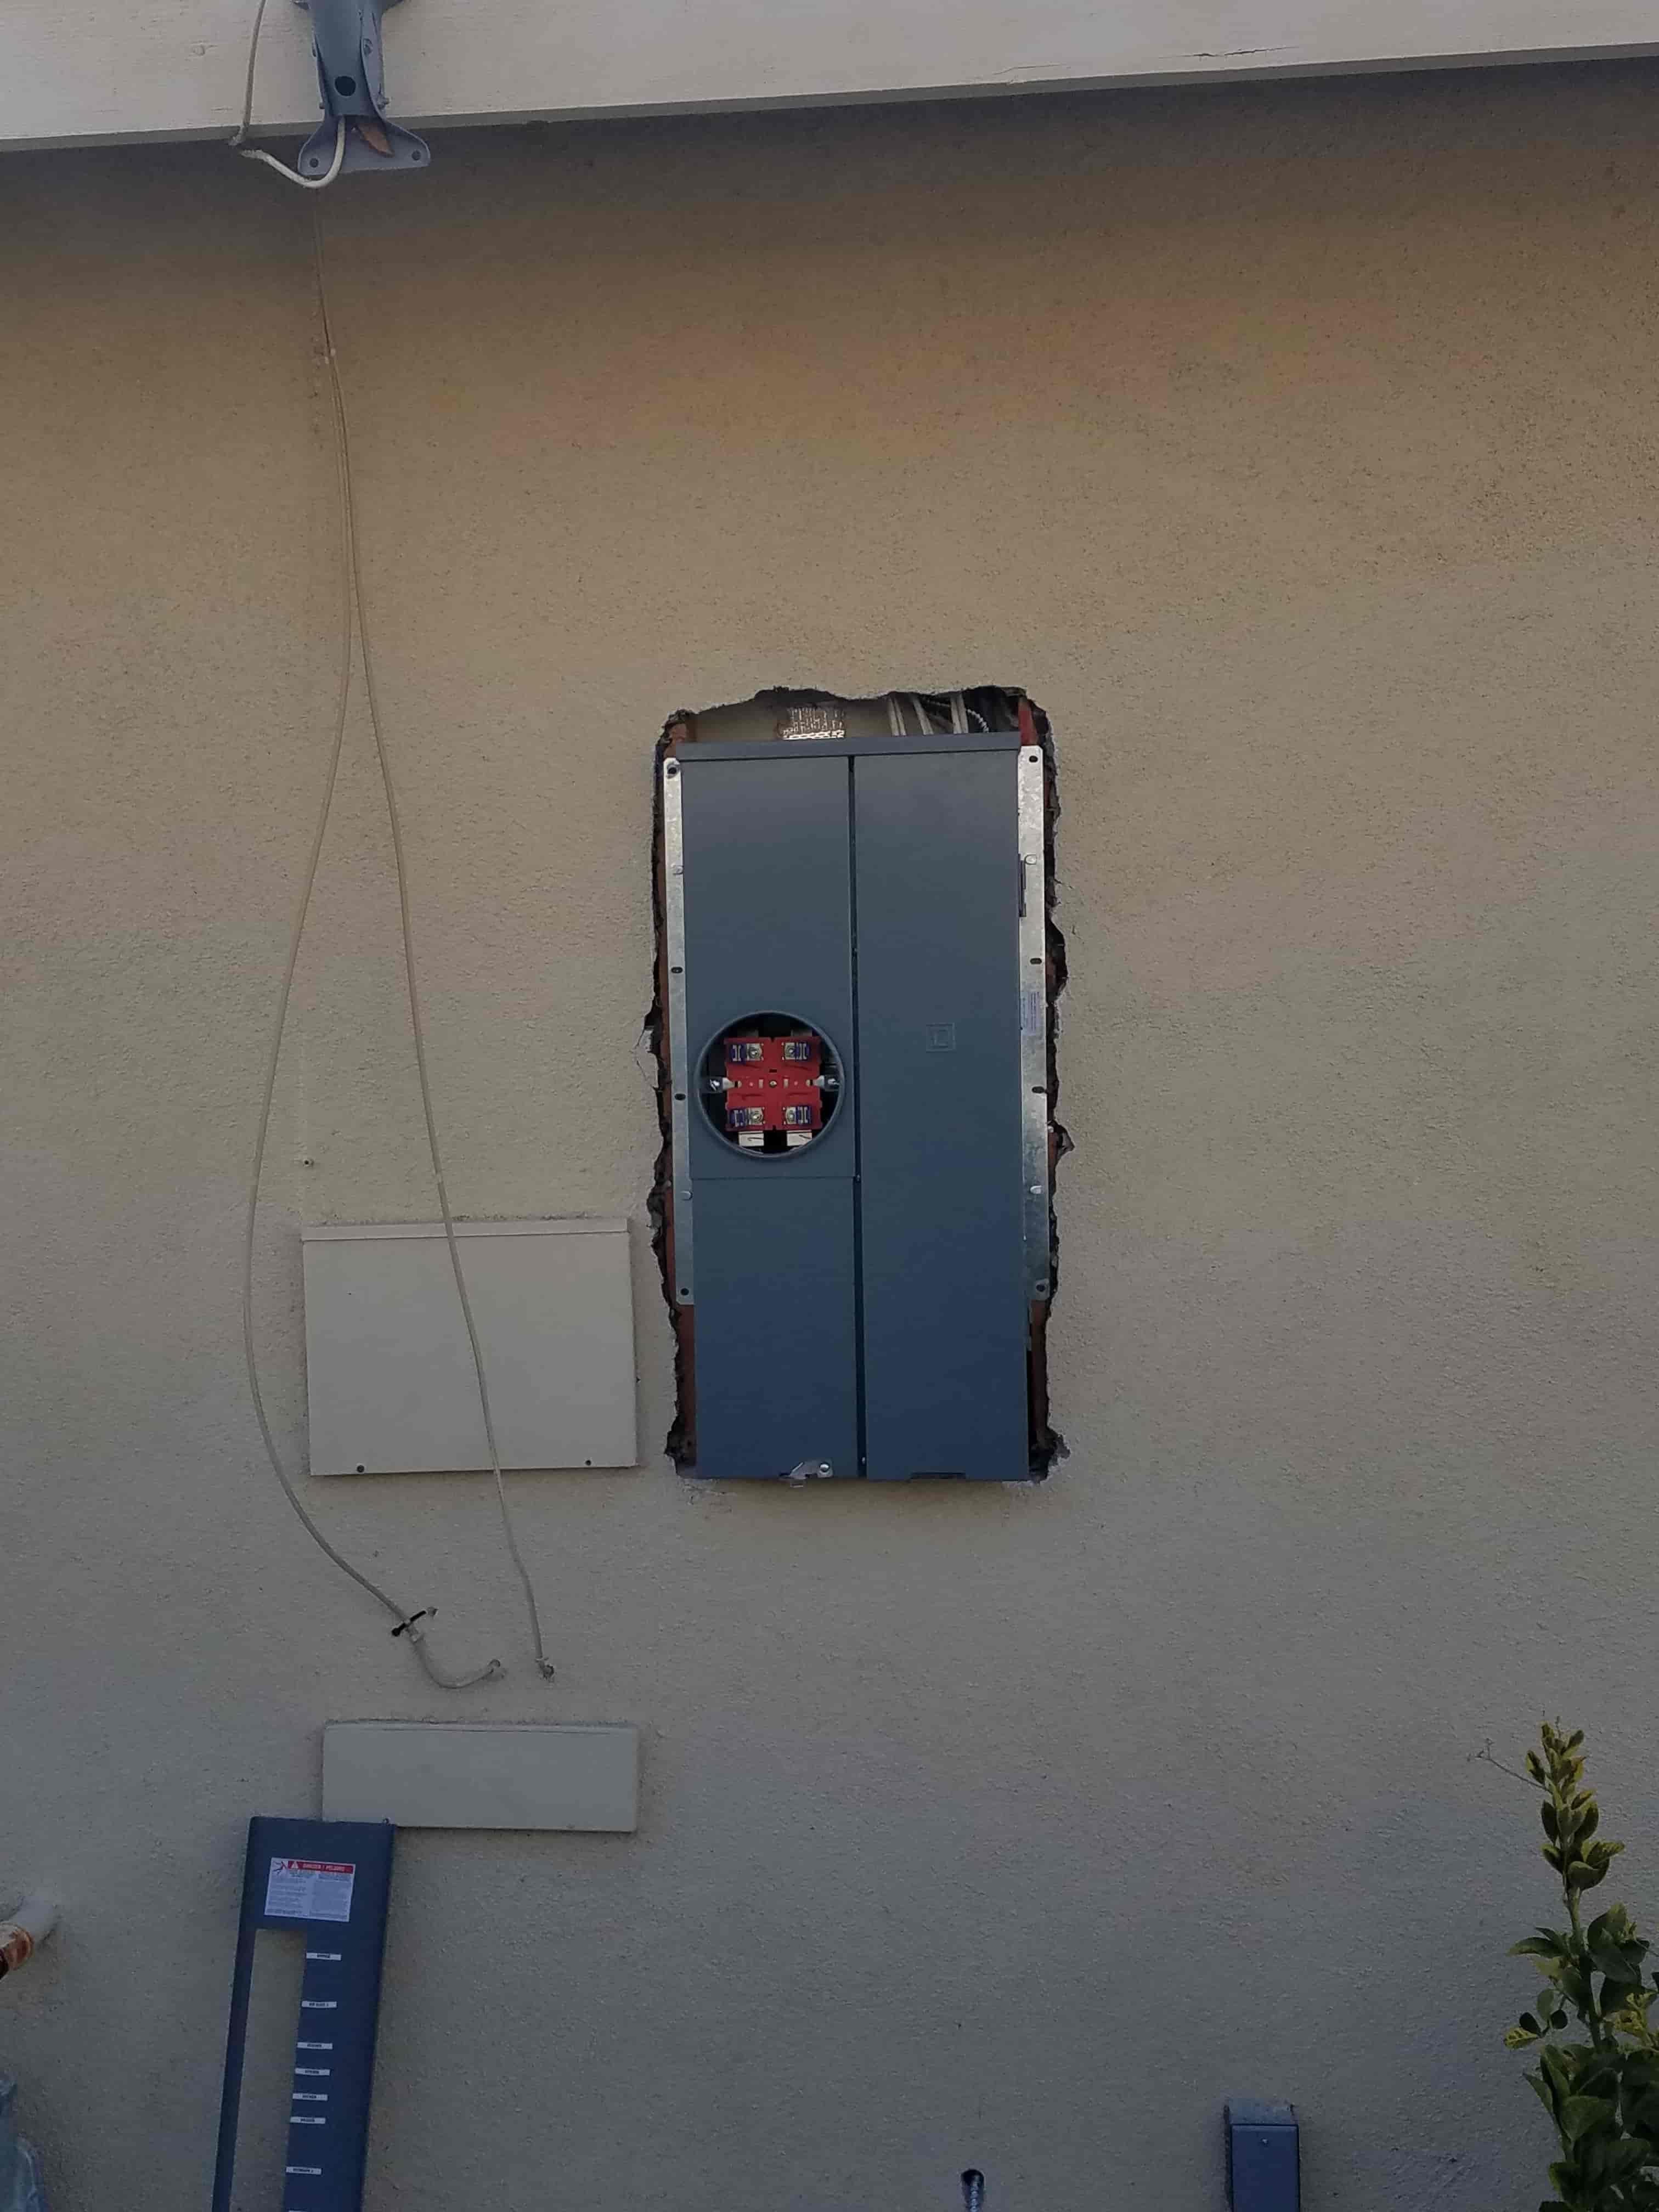 New Electric Meter Box